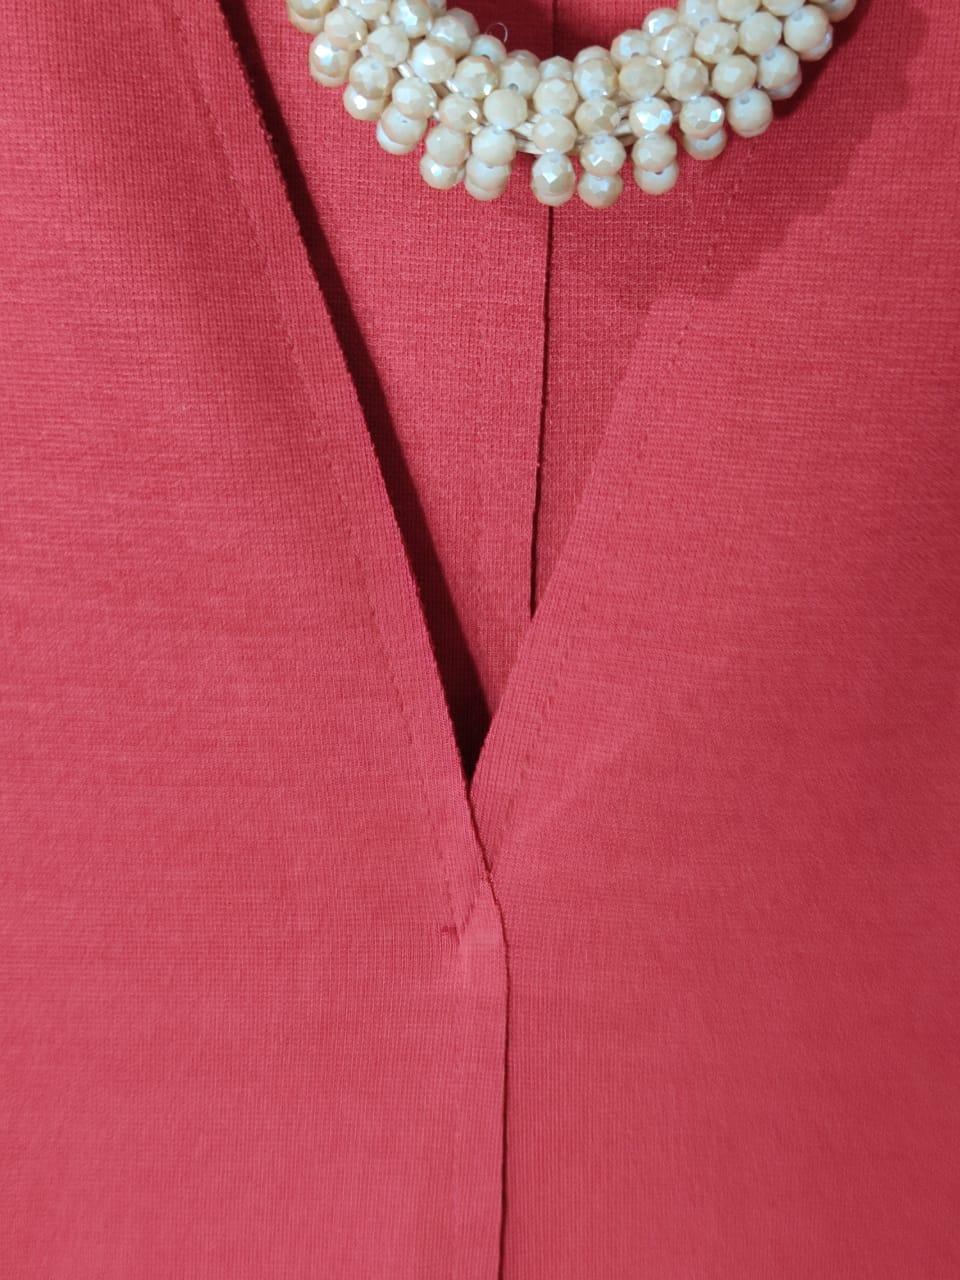 Blusa malha pesada